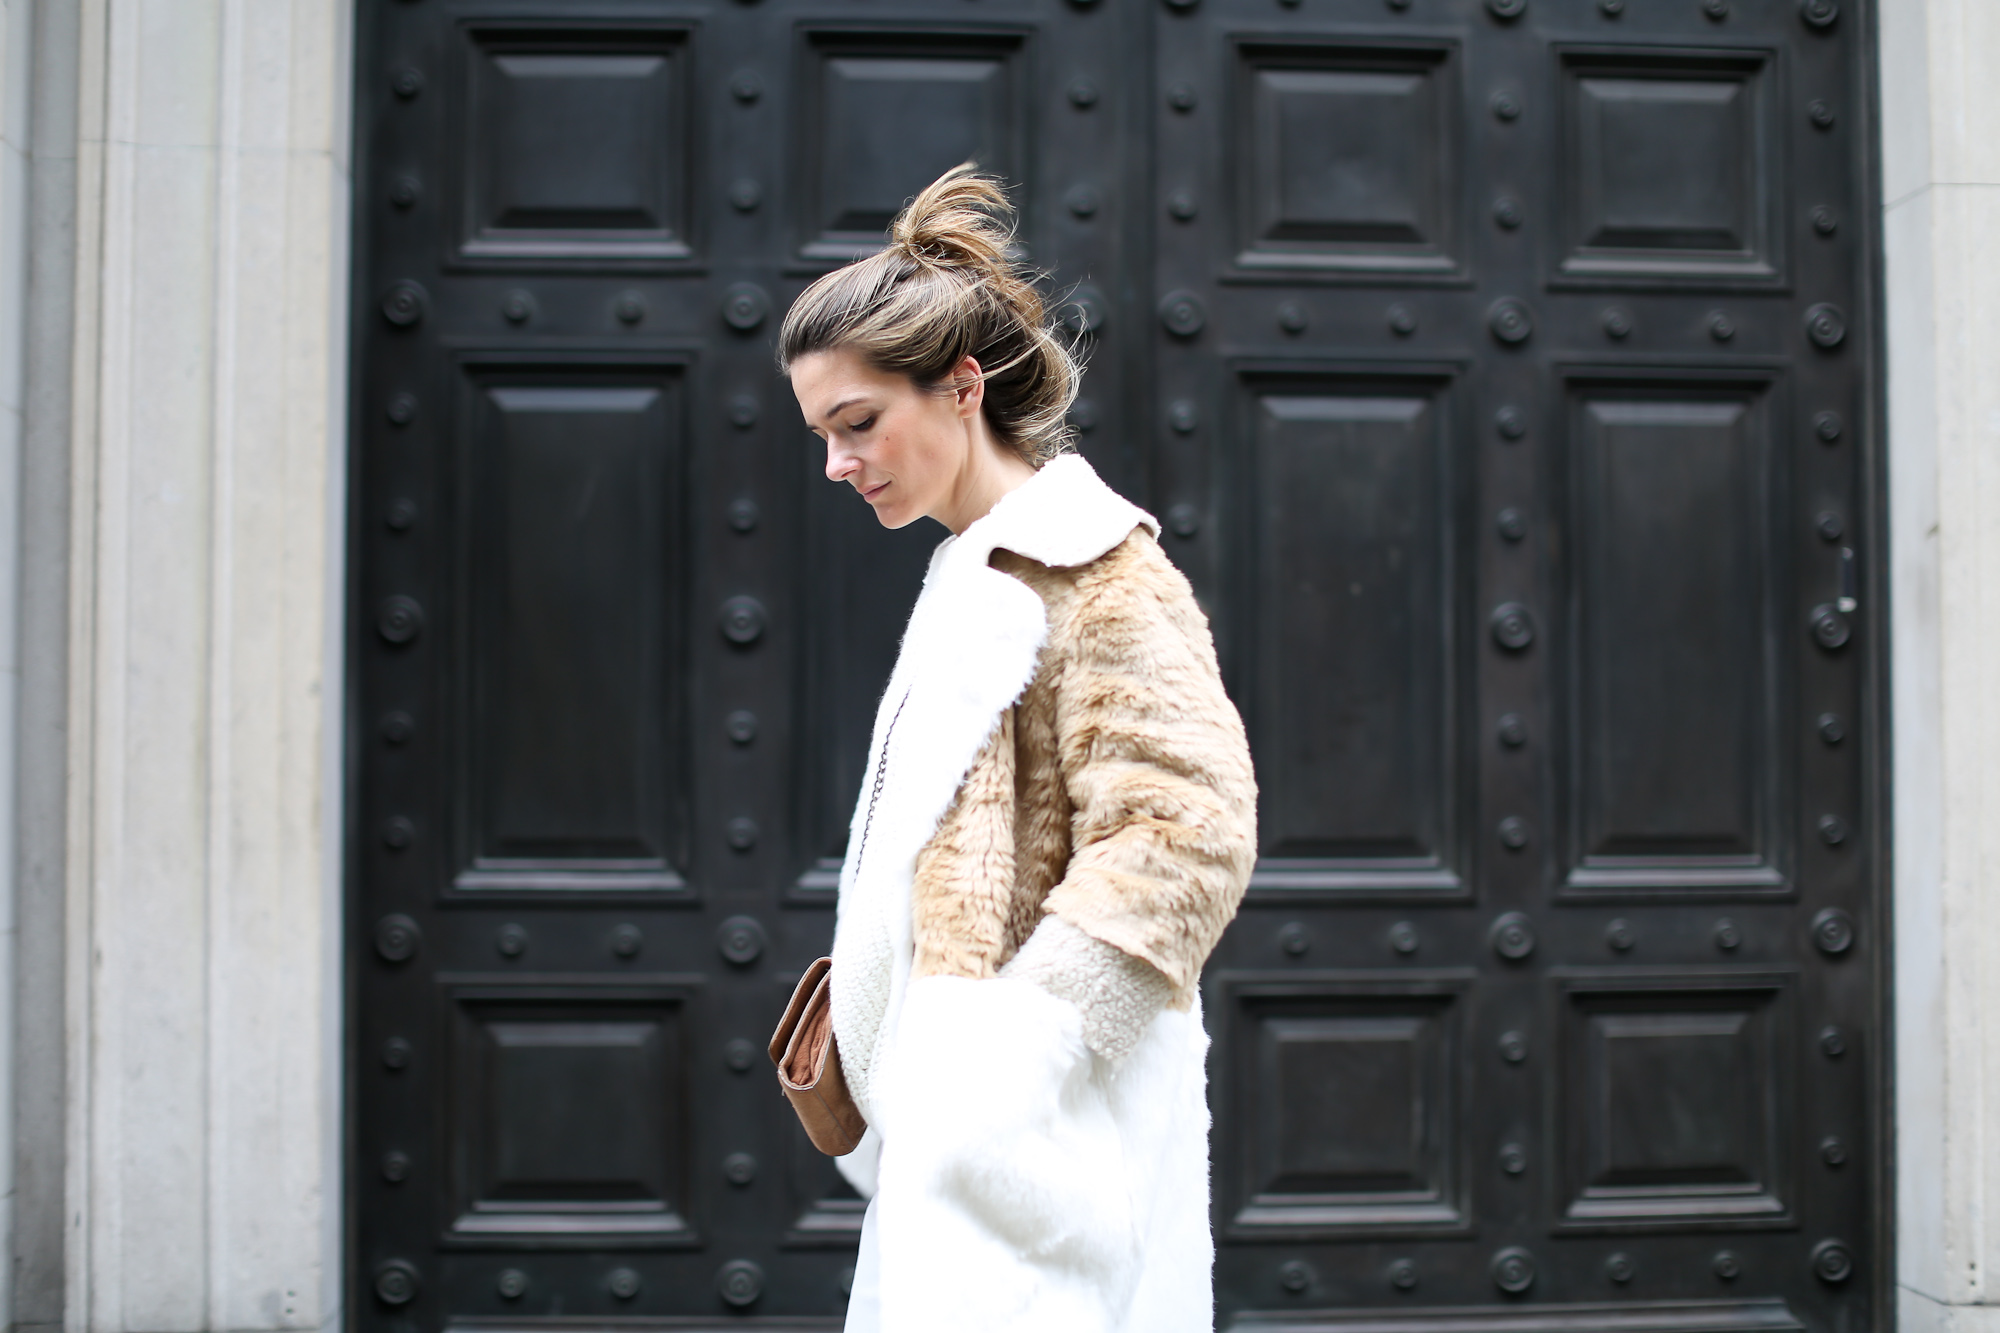 Clochet_streetstyle_asos_patchwork_faux_fur_coat_goldengoose_superstar_sneakers_topshopunique_show-19